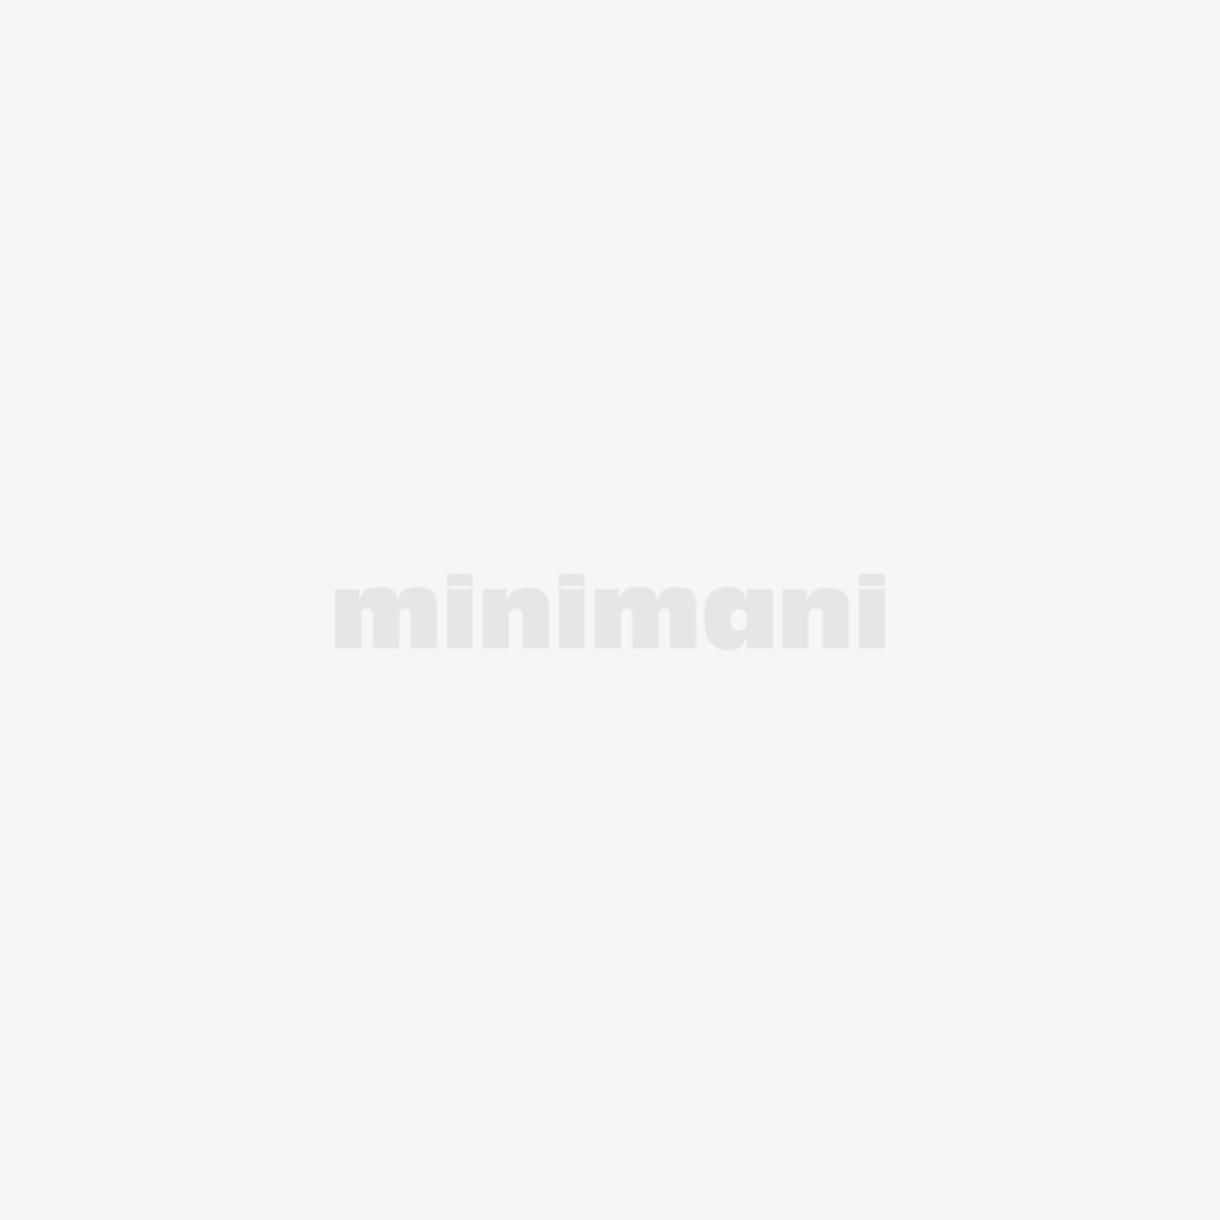 Milwaukee akkuporakone M18 BLDD-502C